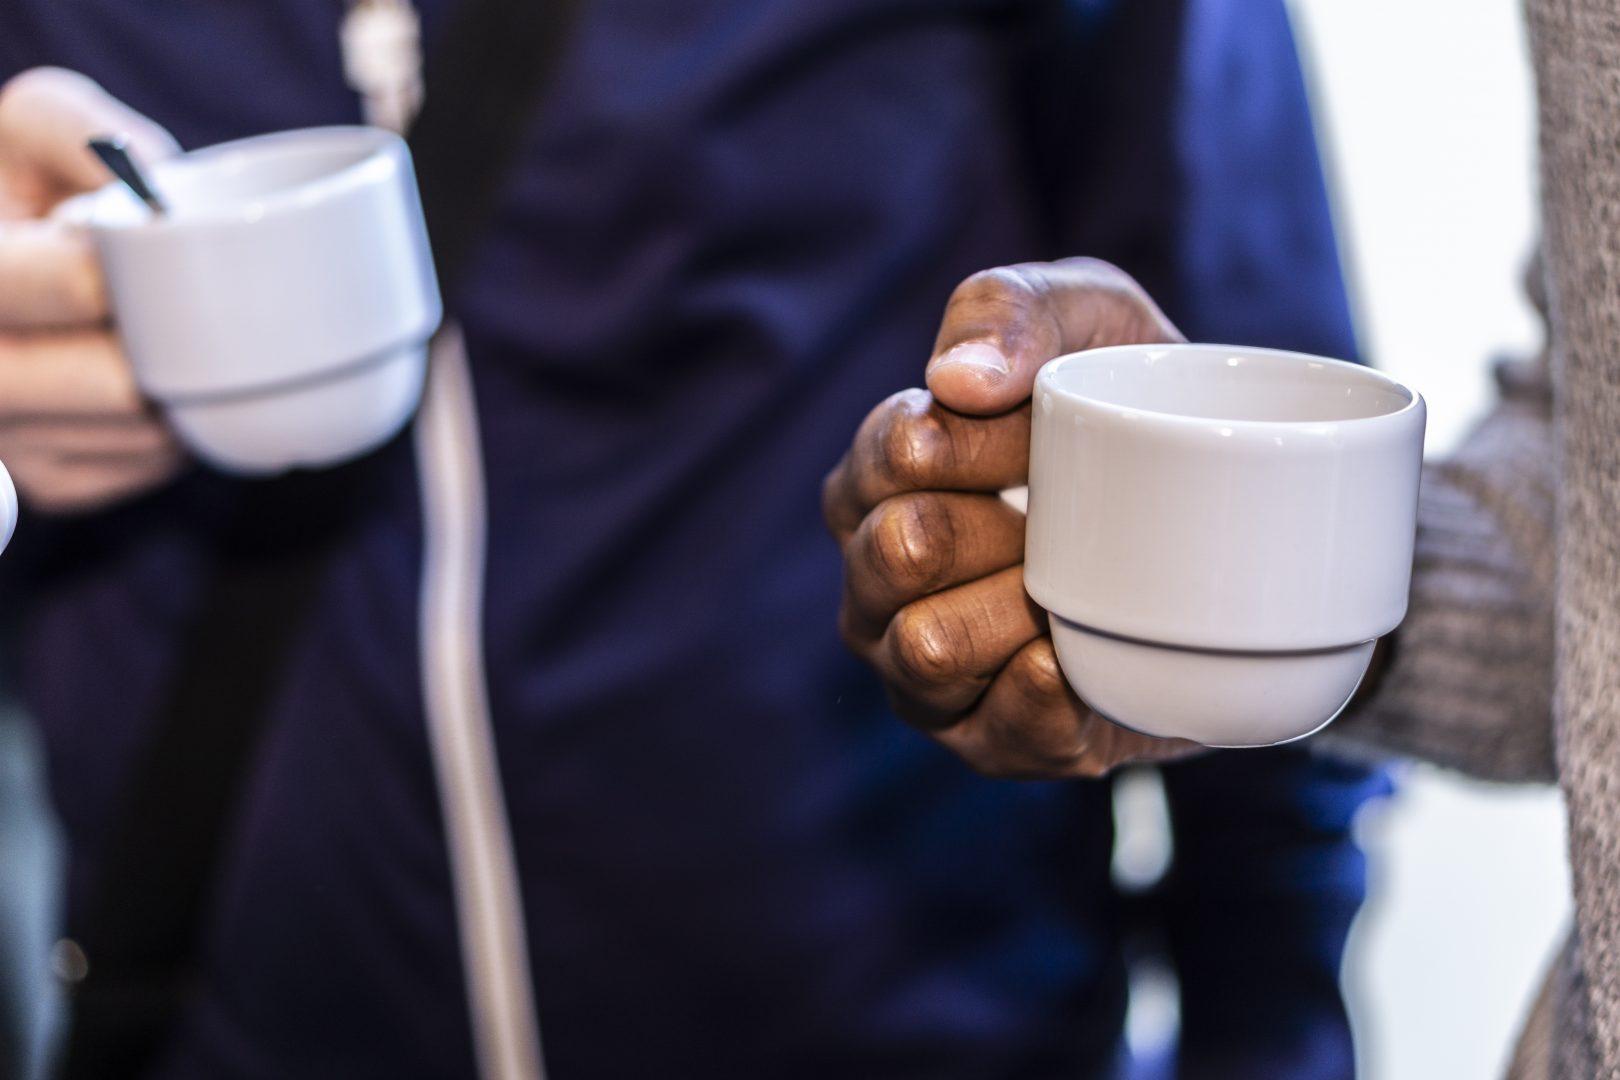 Kopje koffie vasthouden